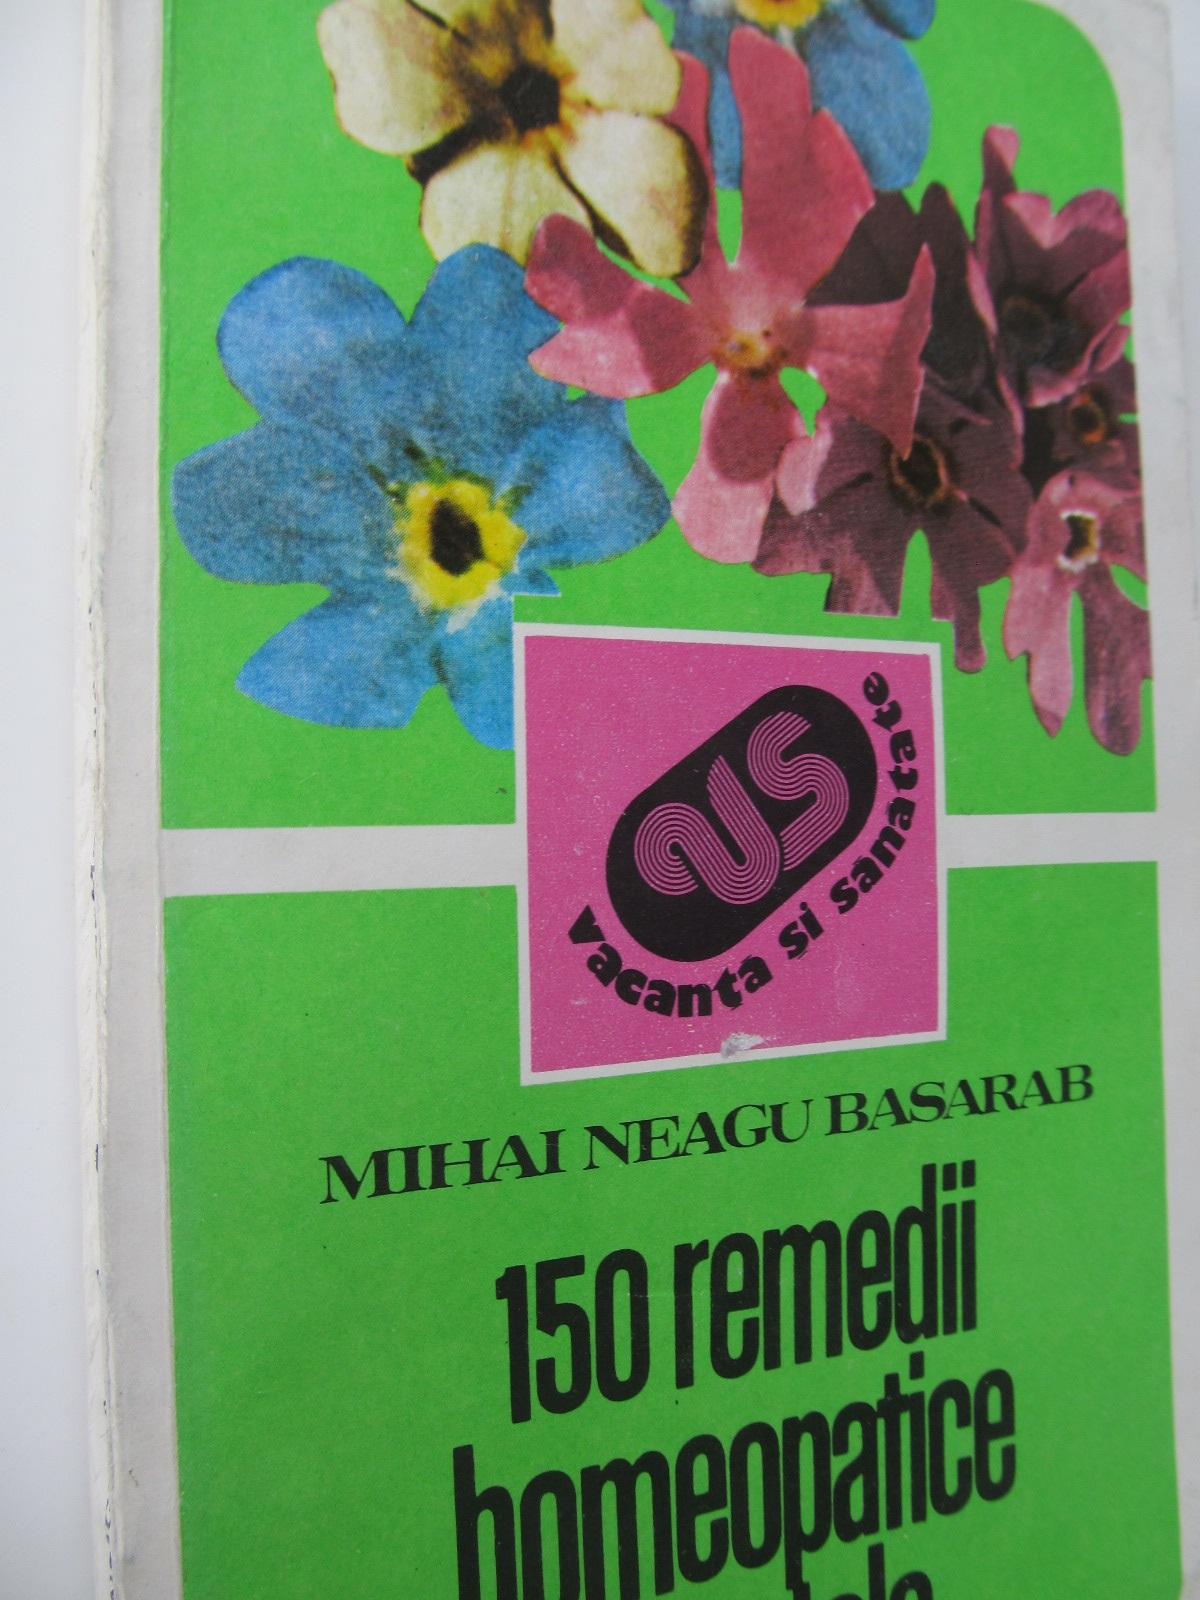 150 remedii homeopatice vegetale - Mihai Neagu Basarab | Detalii carte